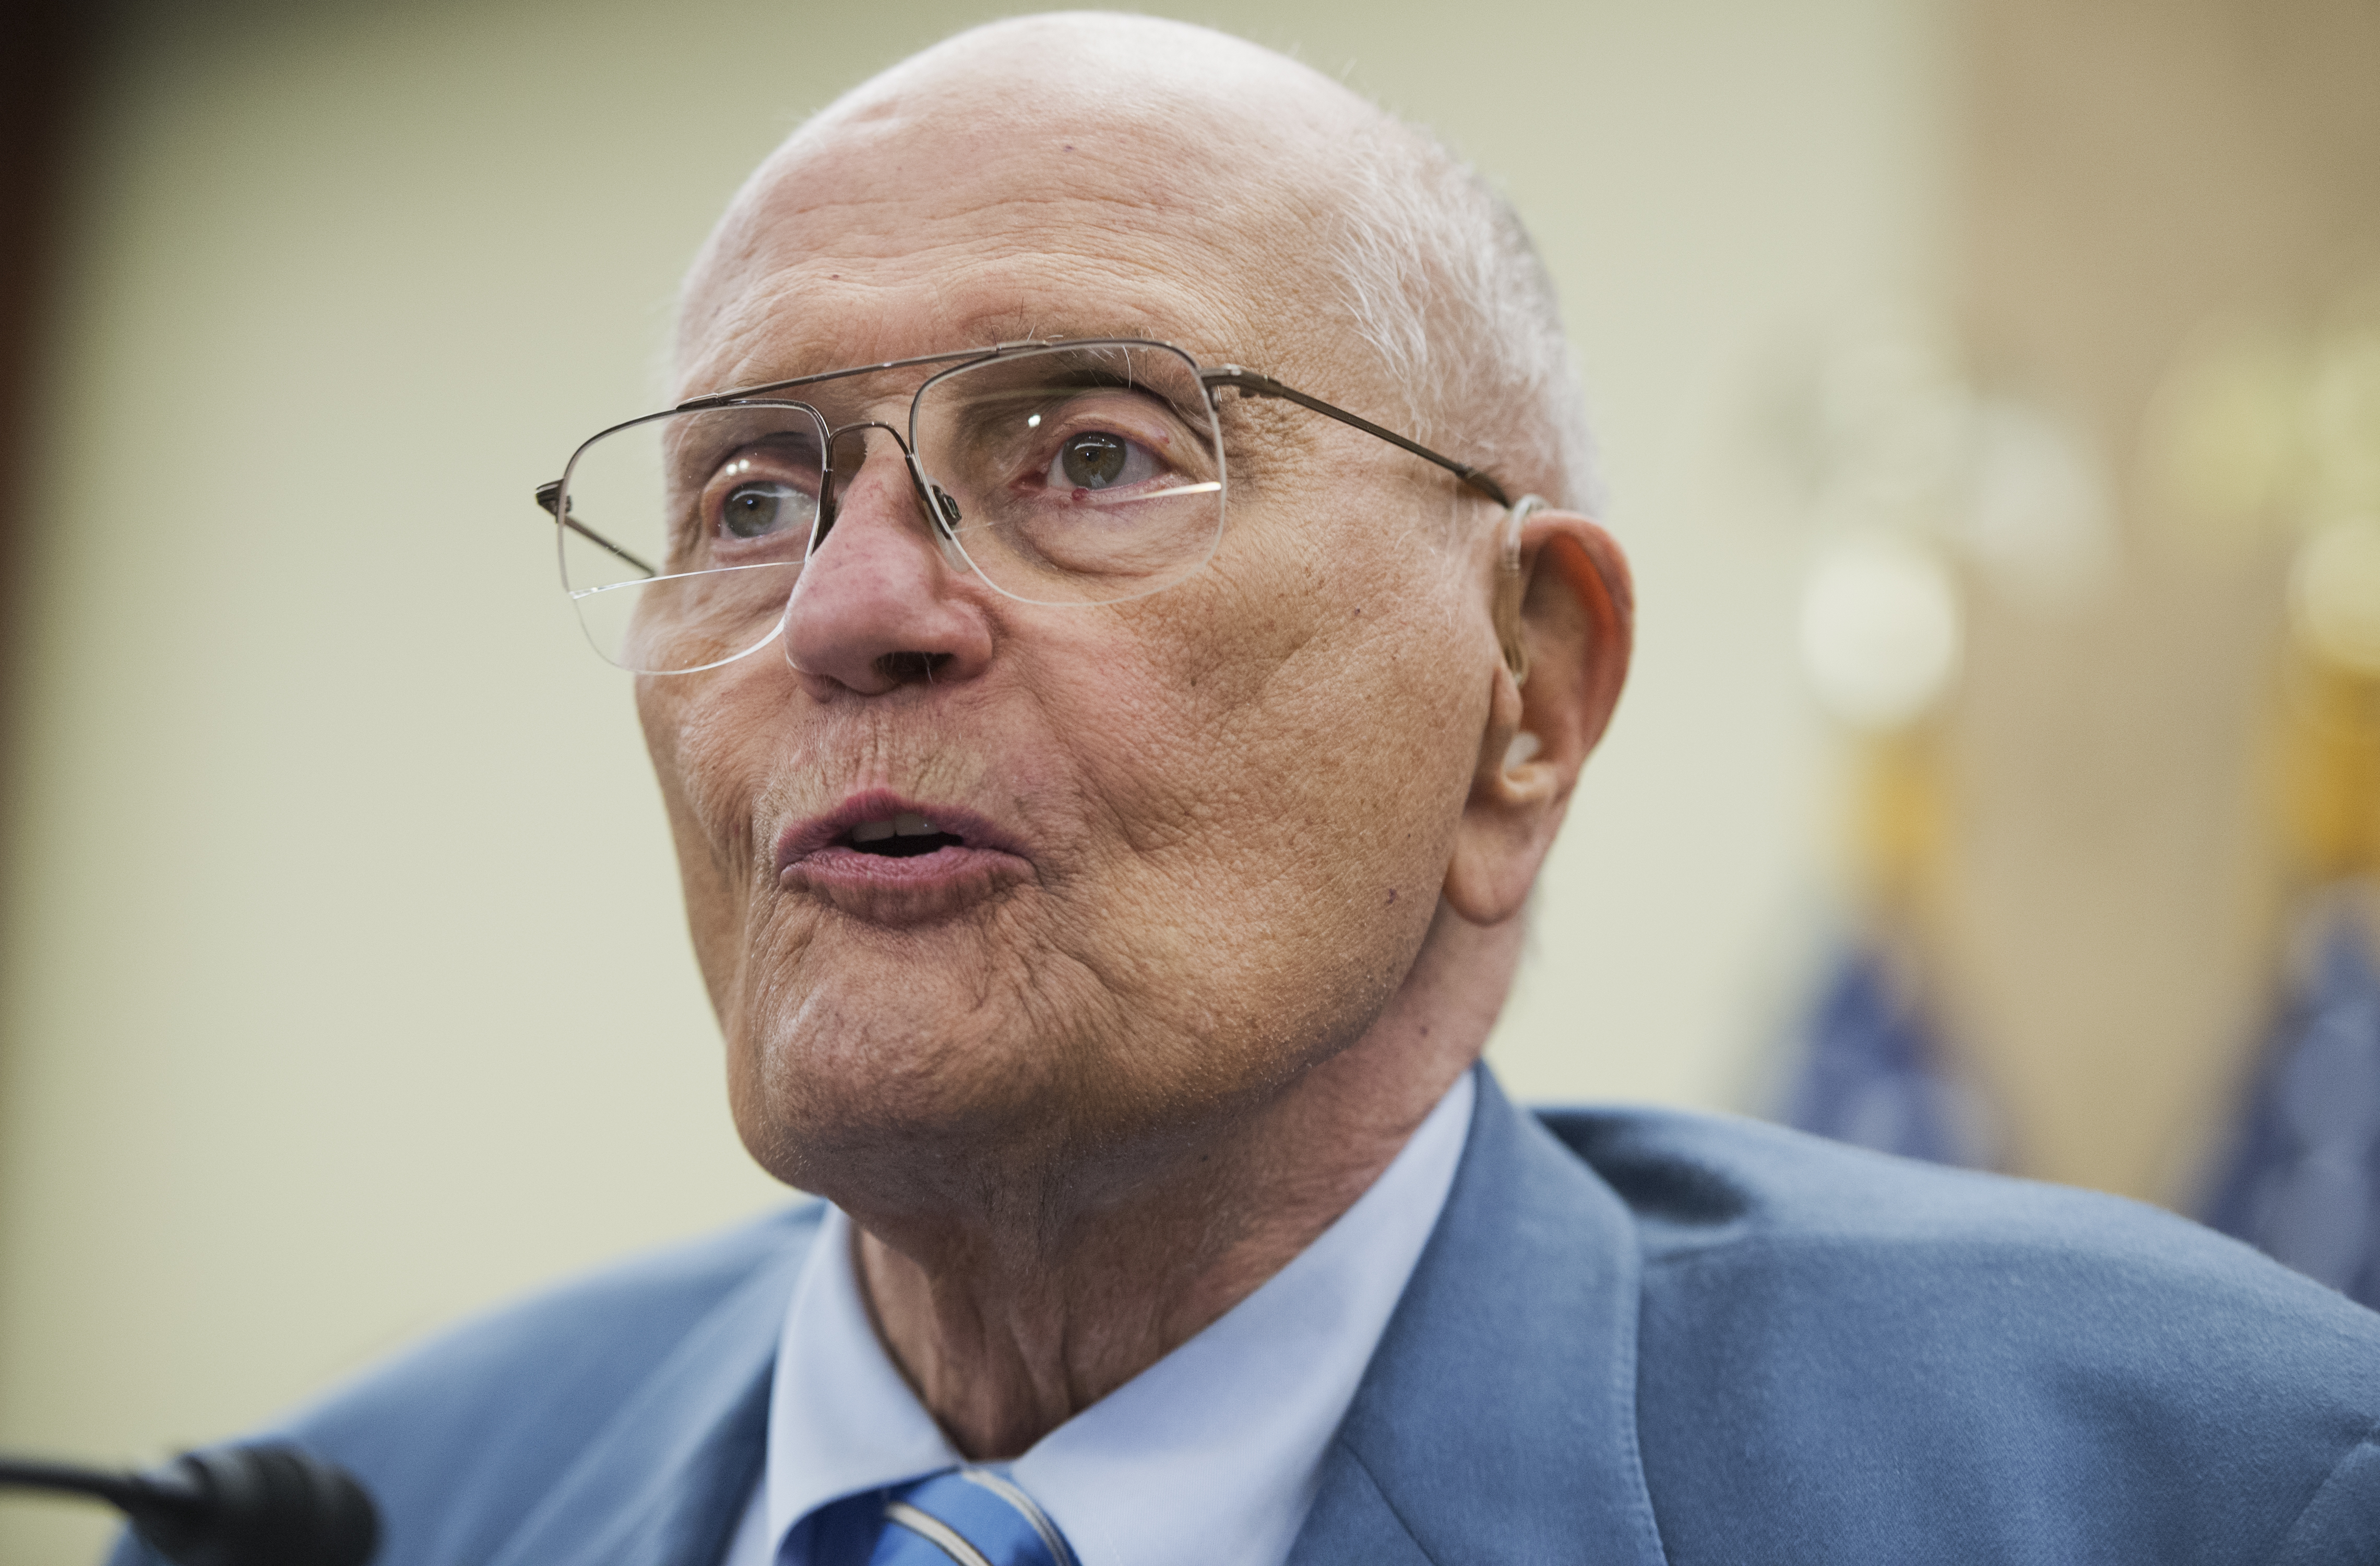 Rep. John Dingell, D-Mich., in 2013.